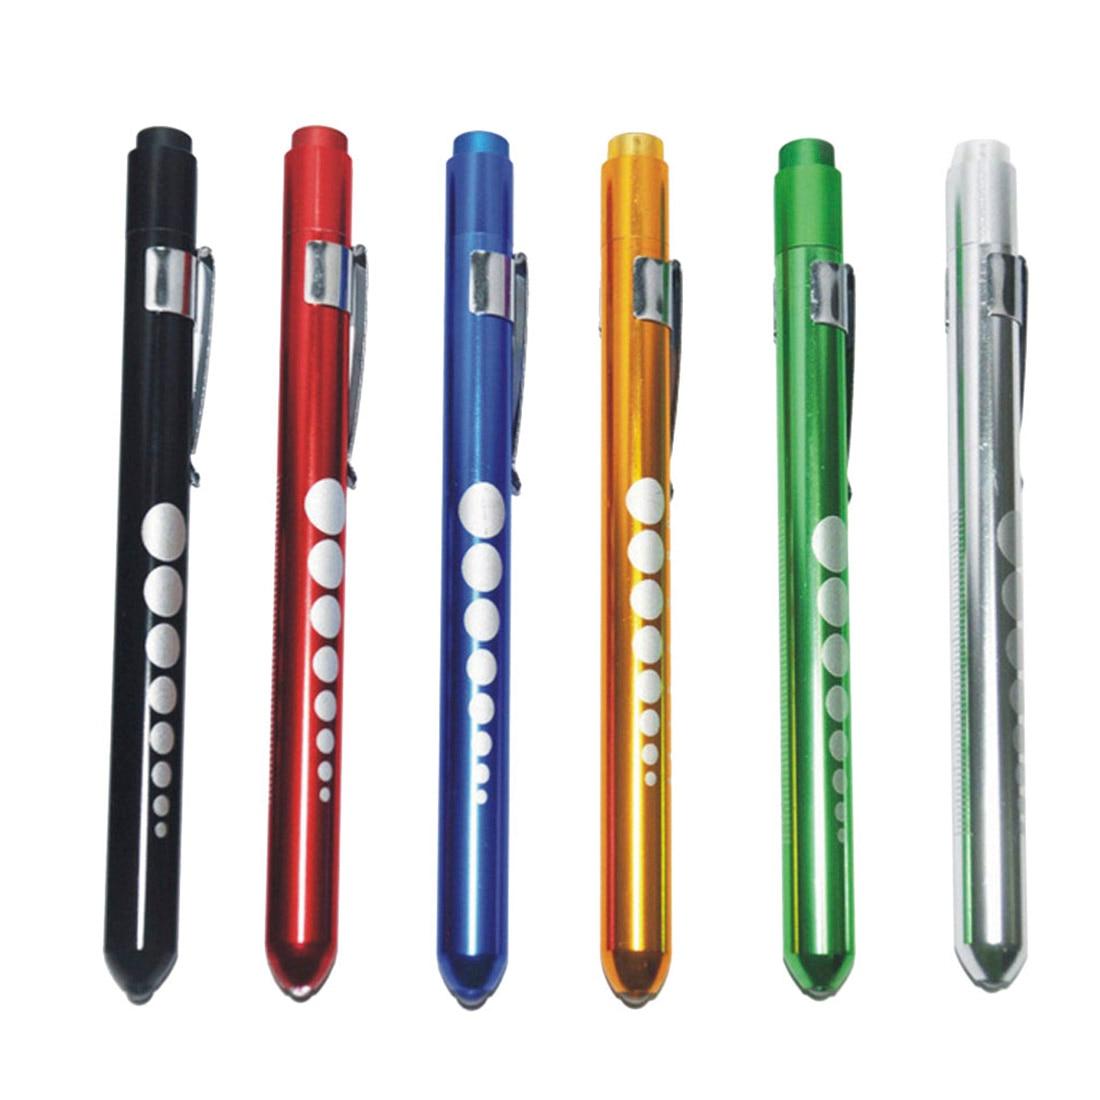 Medical Flashlight Pen Flashlight Pupil Lamp 1PC Penlight Torch Emergency Medical Doctor Nurse Surgical First Aid Necessity